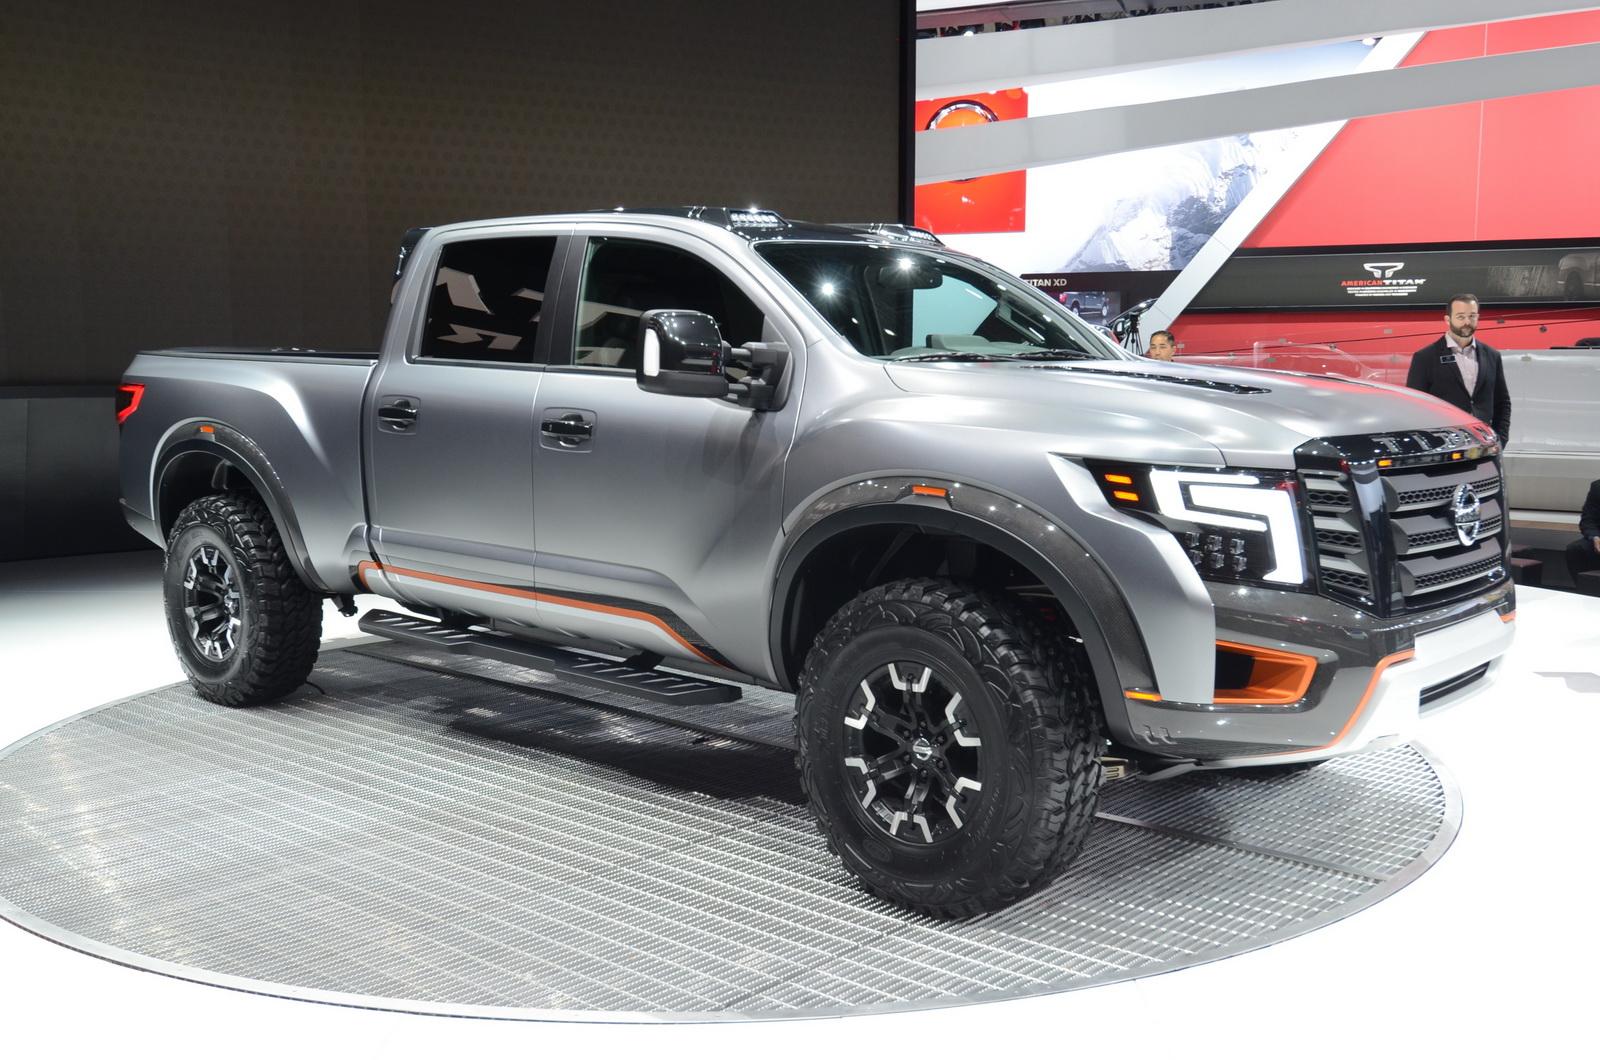 nissan s titan warrior concept is proof we need more baja inspired trucks carscoops. Black Bedroom Furniture Sets. Home Design Ideas